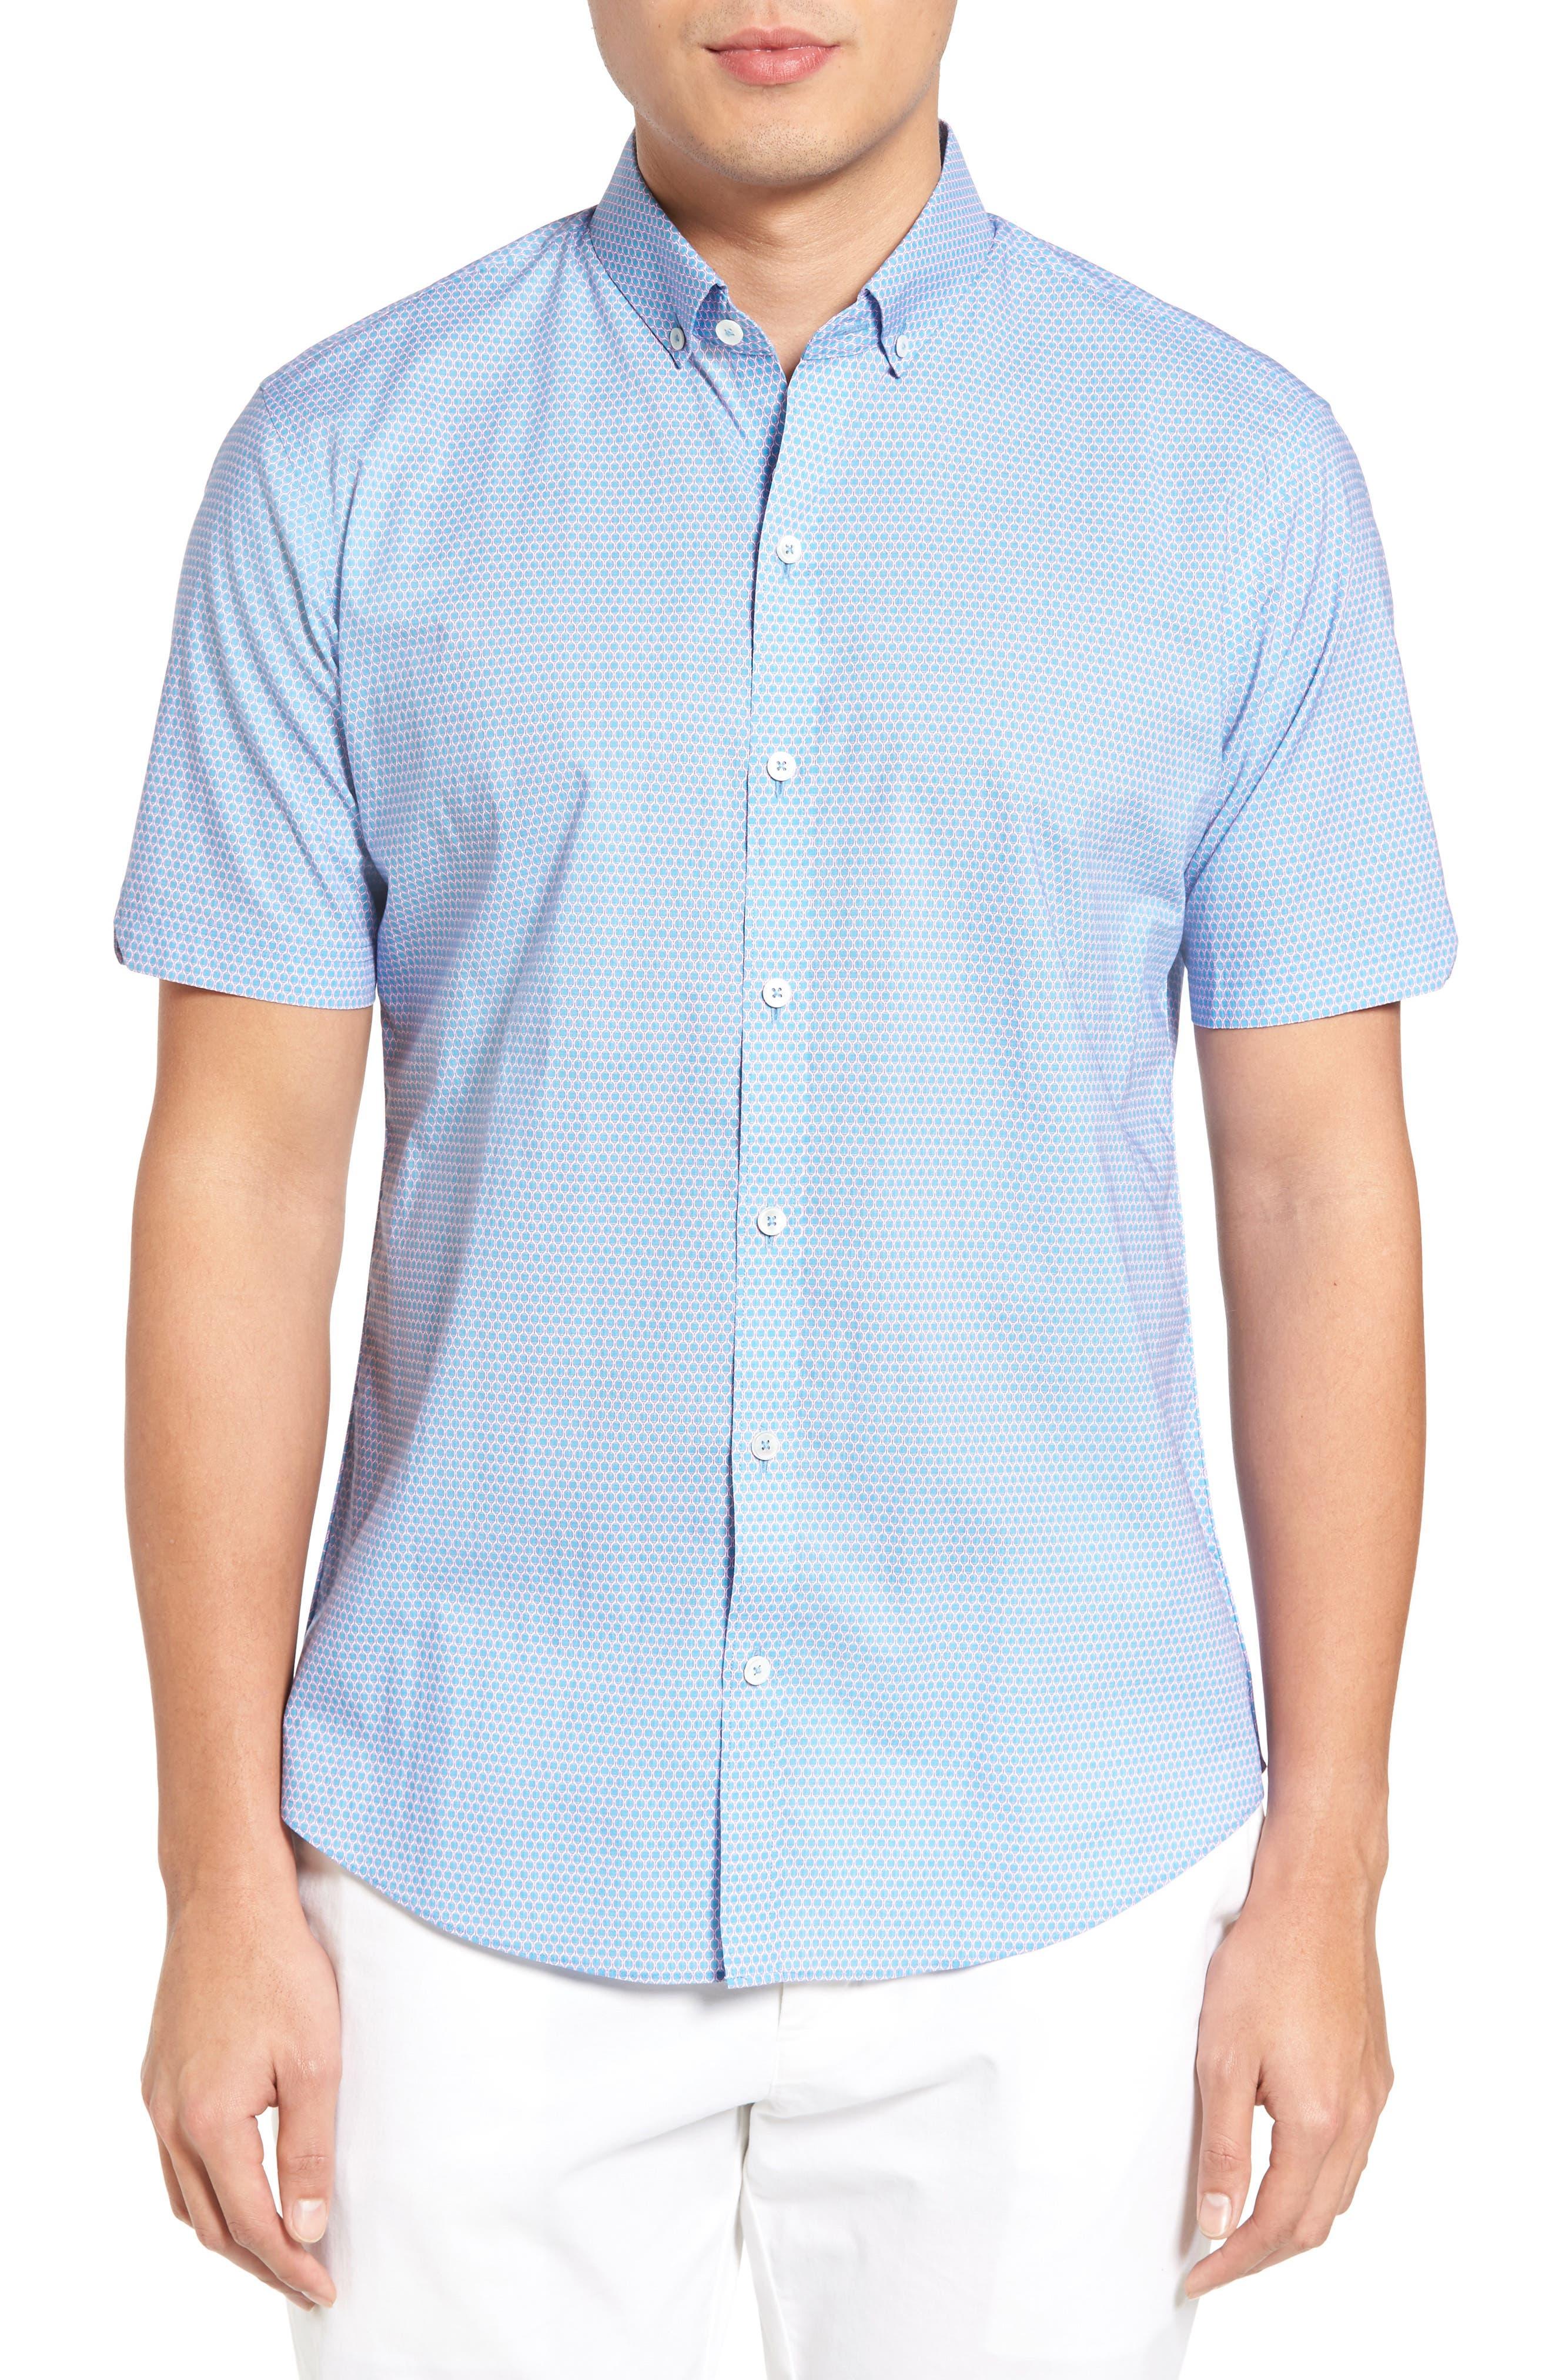 Alternate Image 1 Selected - Zachary Prell Parker Trim Fit Print Sport Shirt